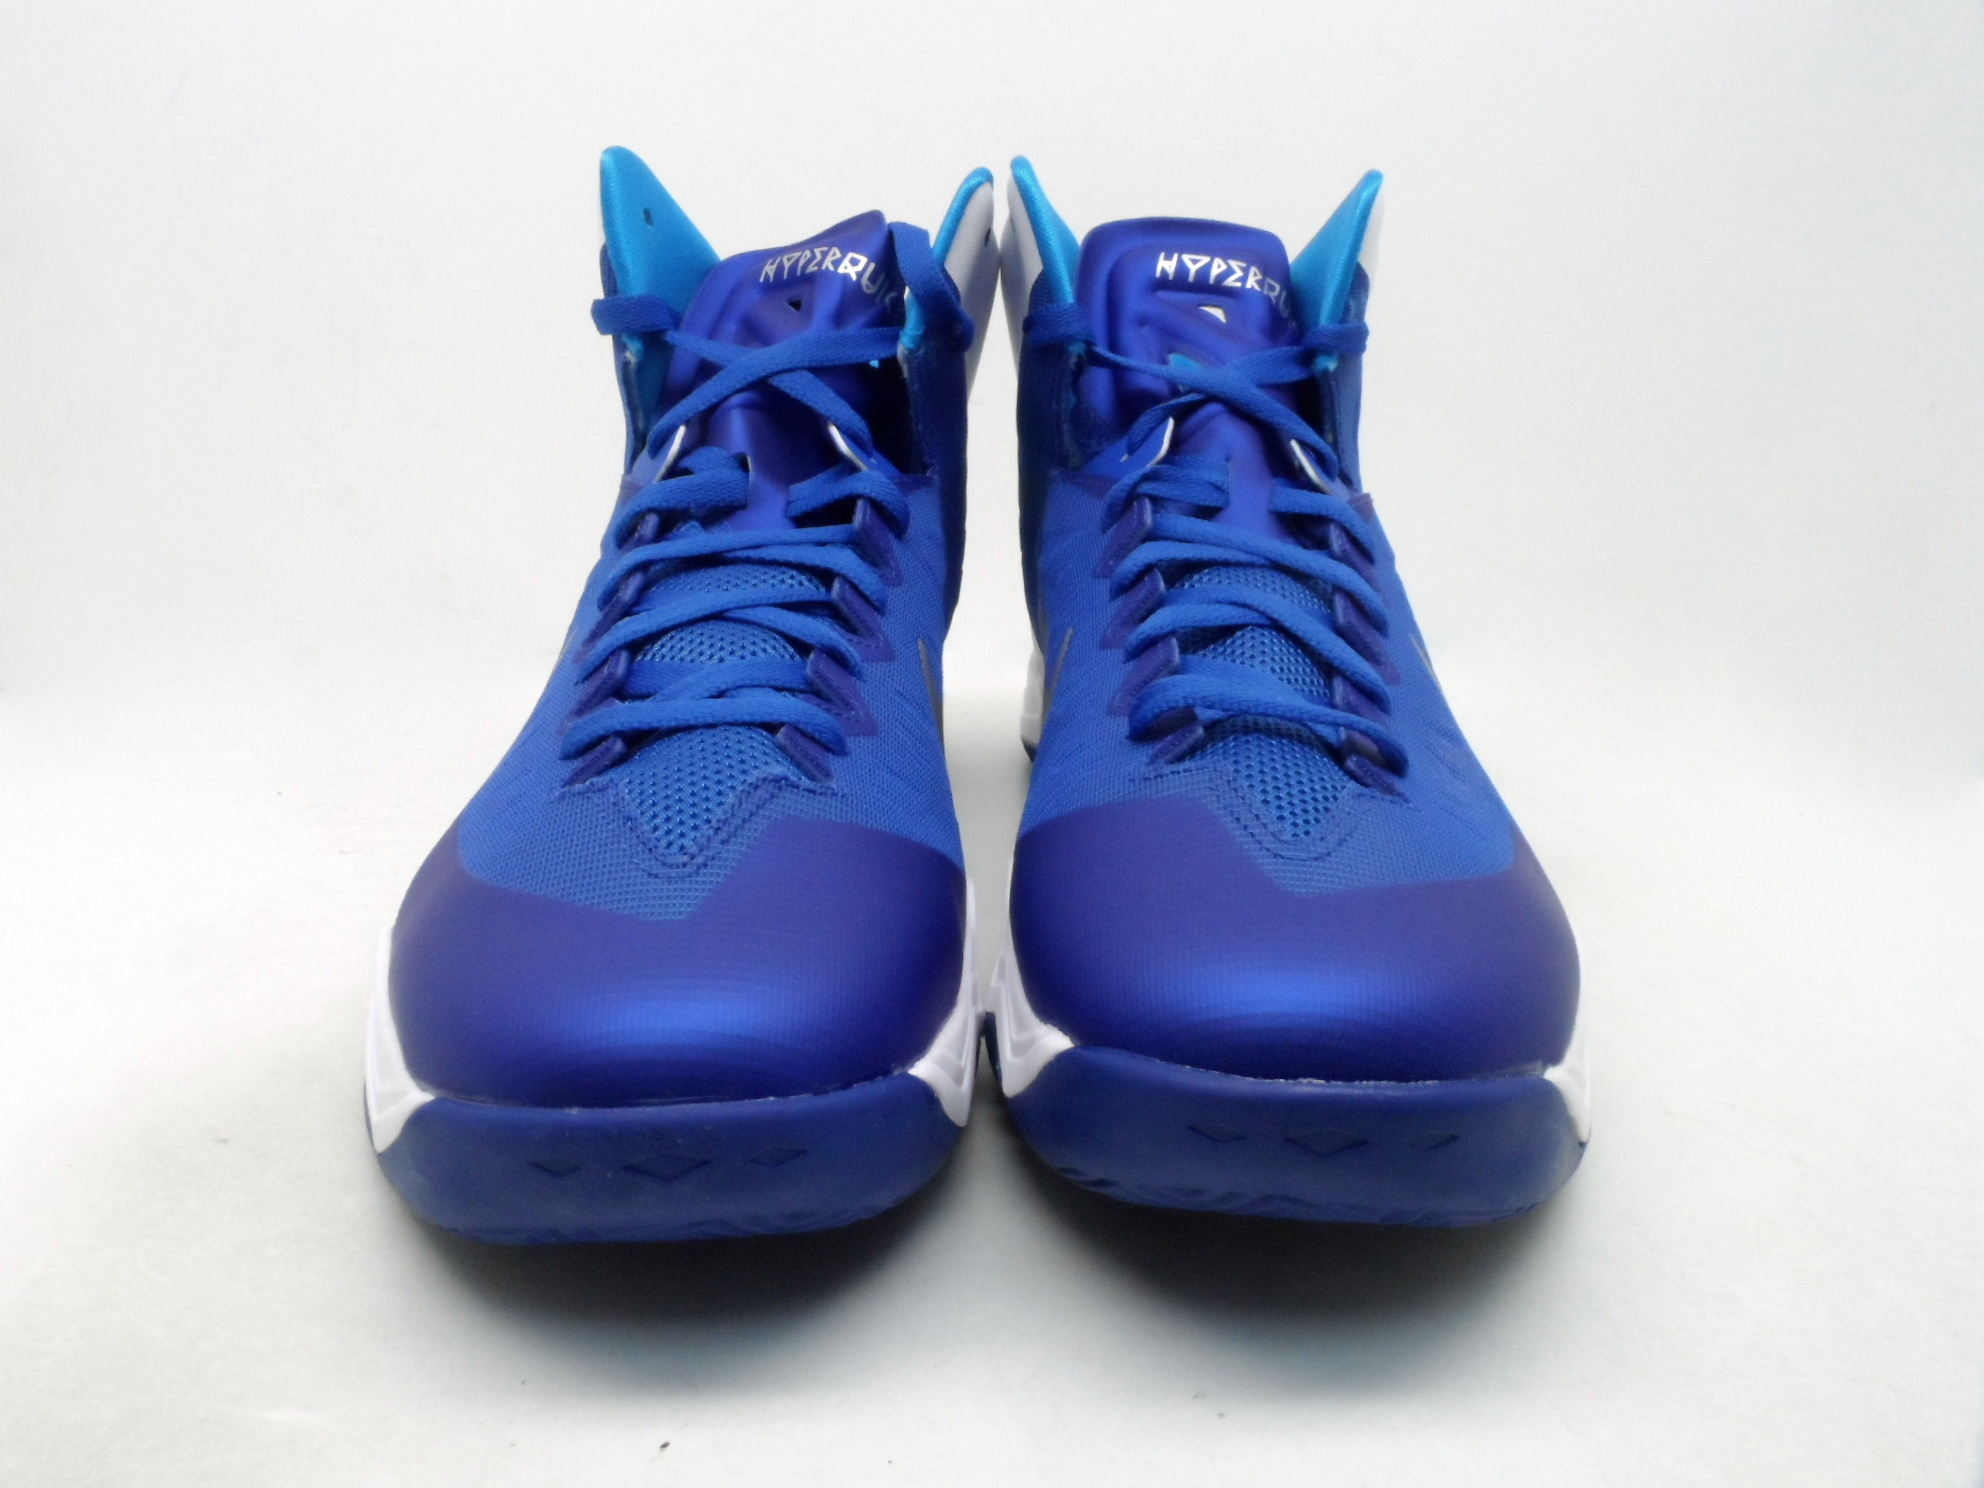 sports shoes c46c9 5c7b2 Nike Basketball Shoes Nike Hyper Quickness Tb